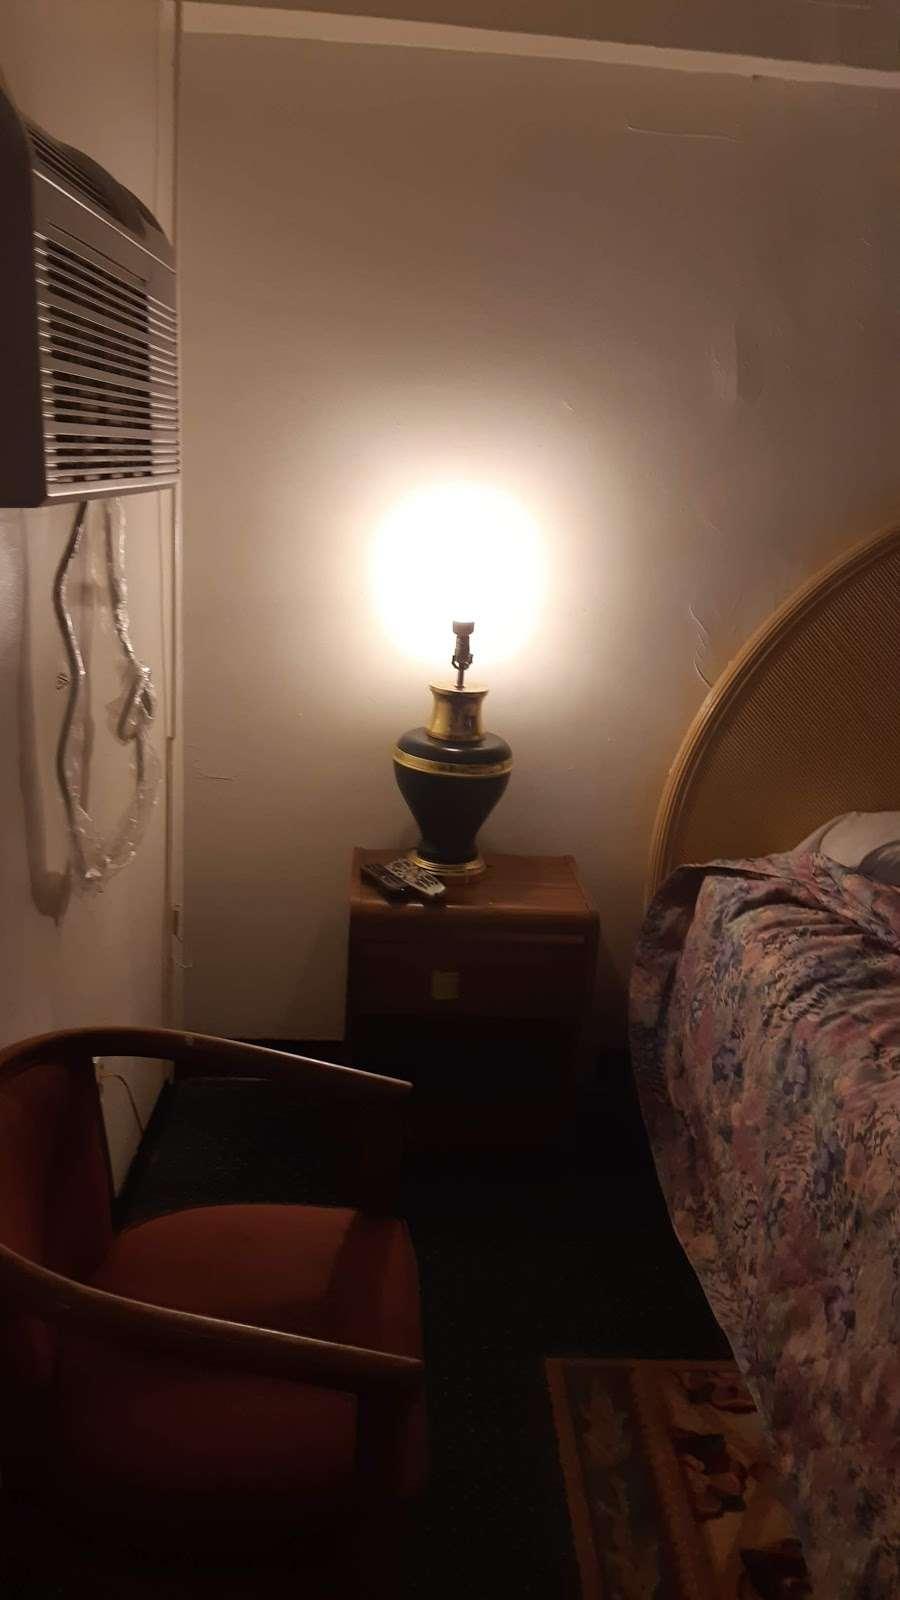 Atco Motel - lodging  | Photo 3 of 10 | Address: 795 White Horse Pike, Atco, NJ 08004, USA | Phone: (856) 719-8550